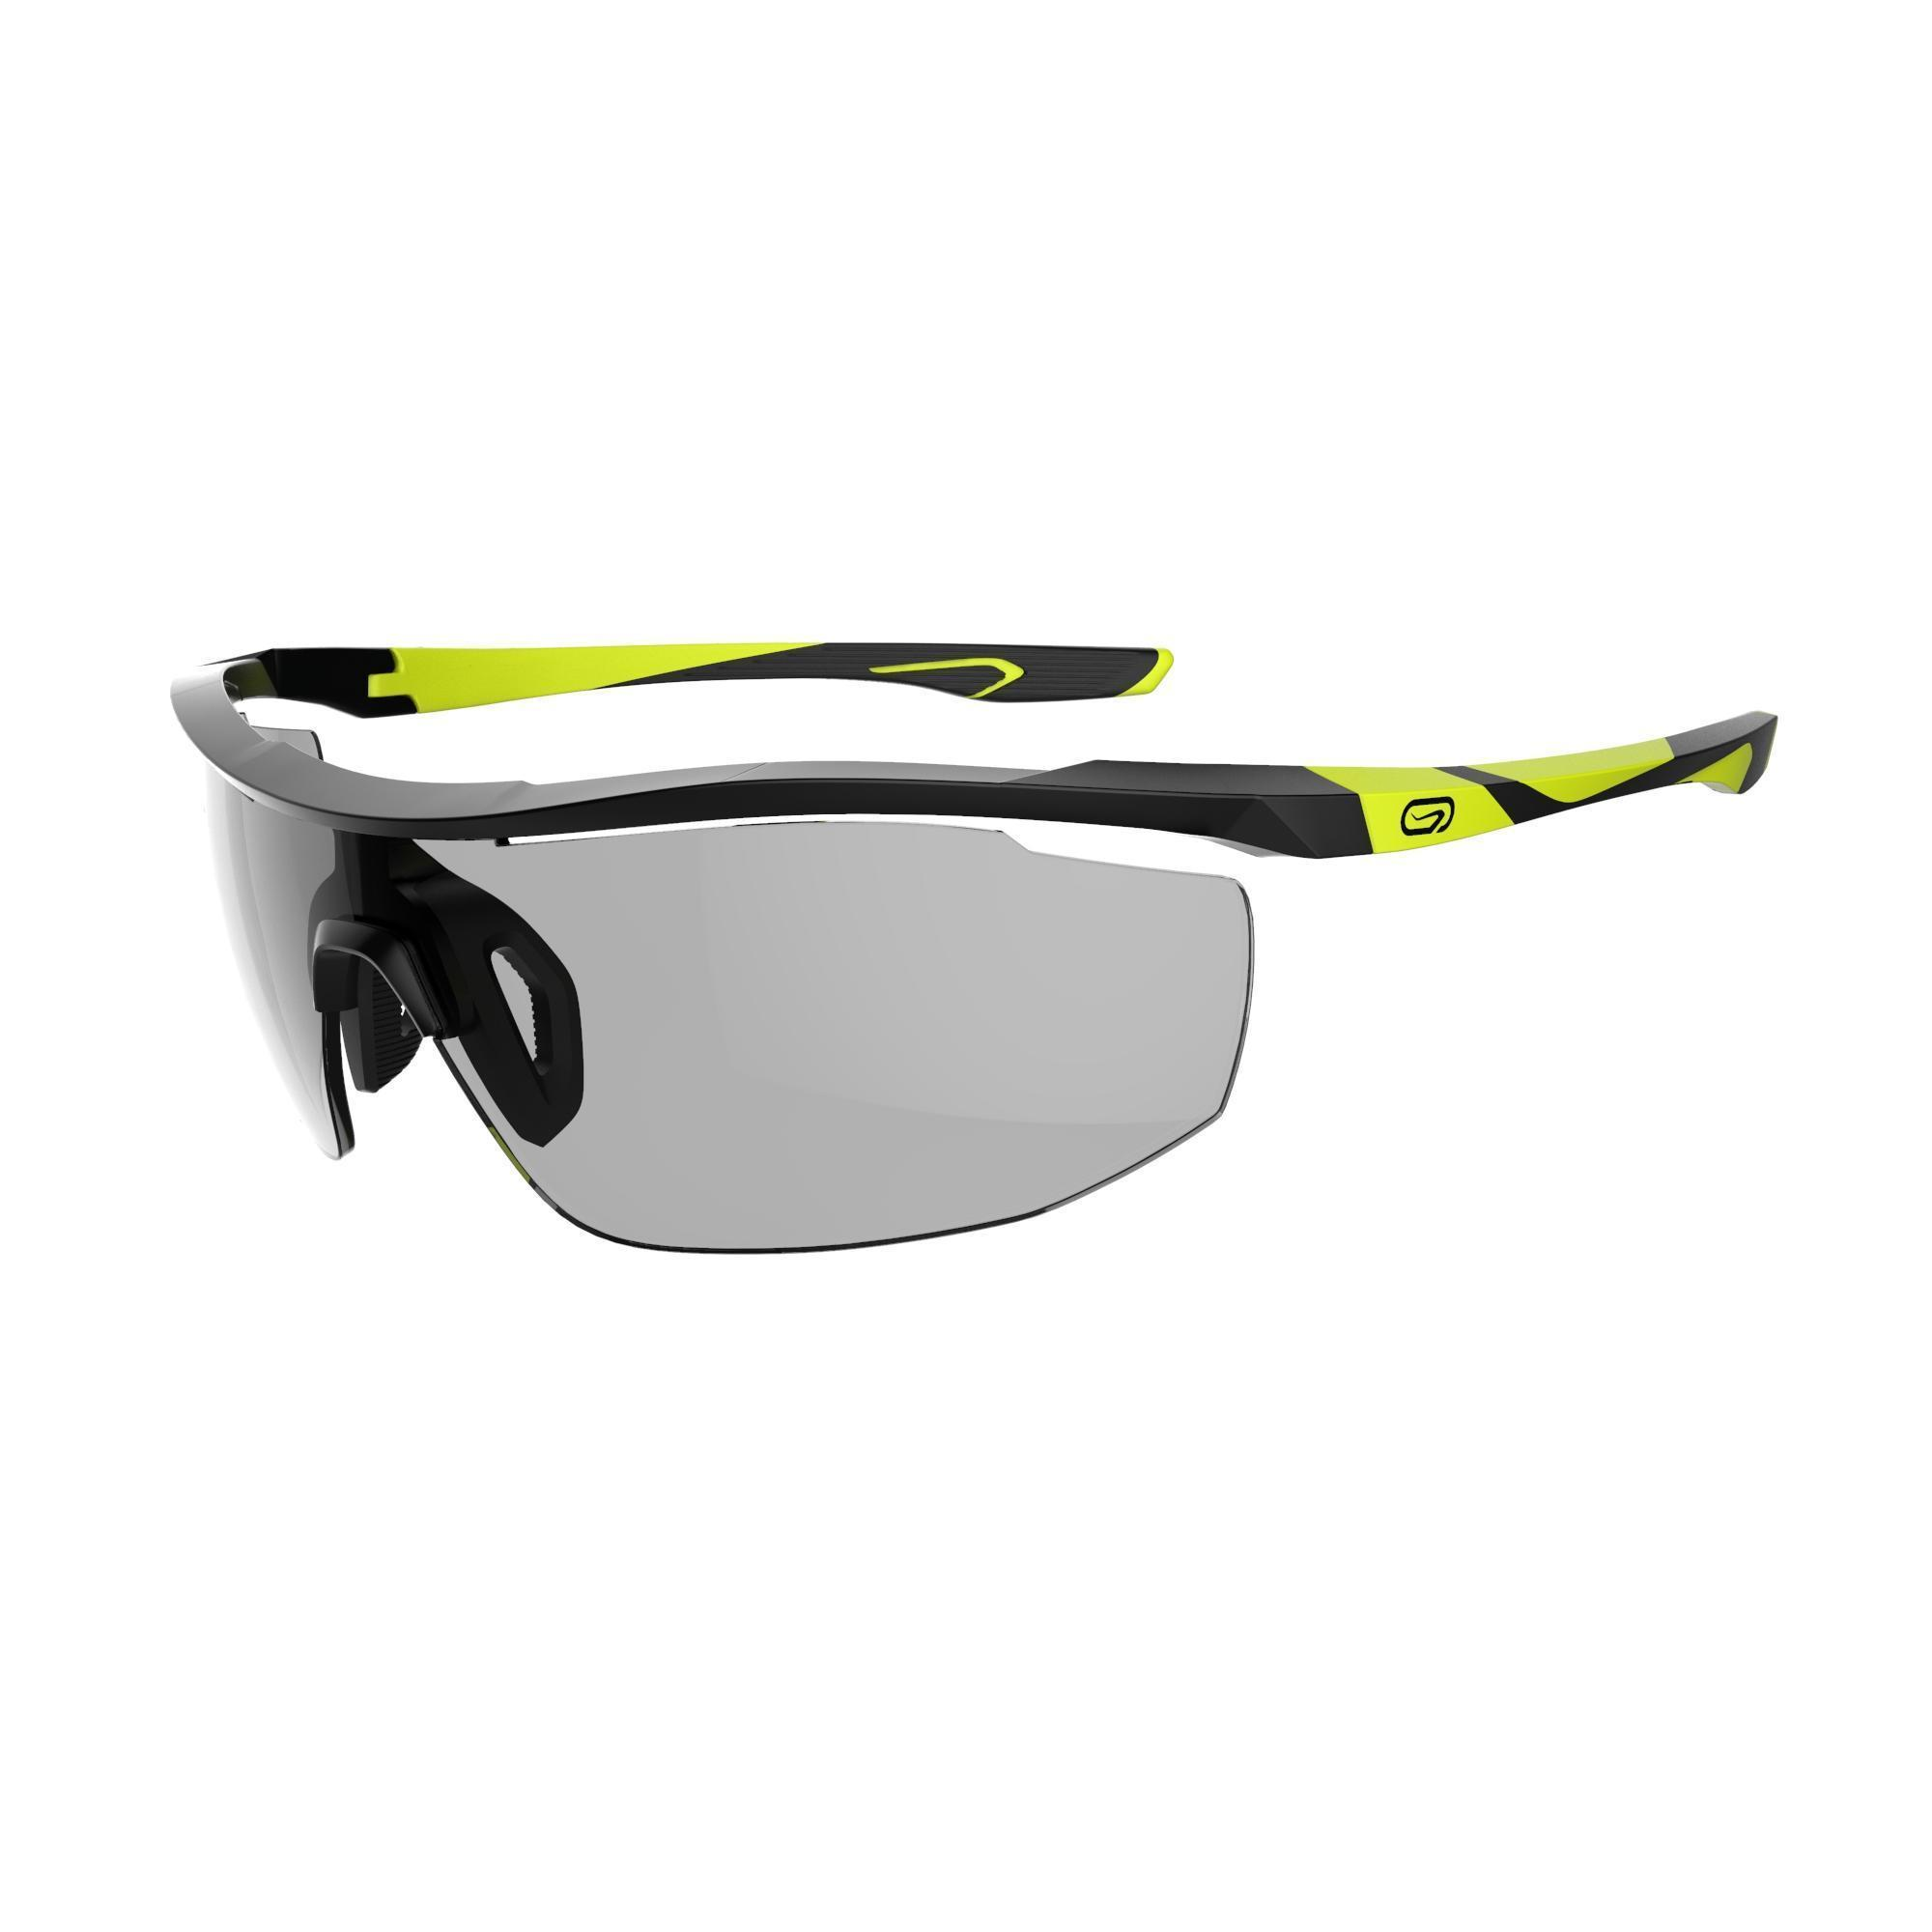 004a843c4b Comprar Gafas de Running para correr | Decathlon